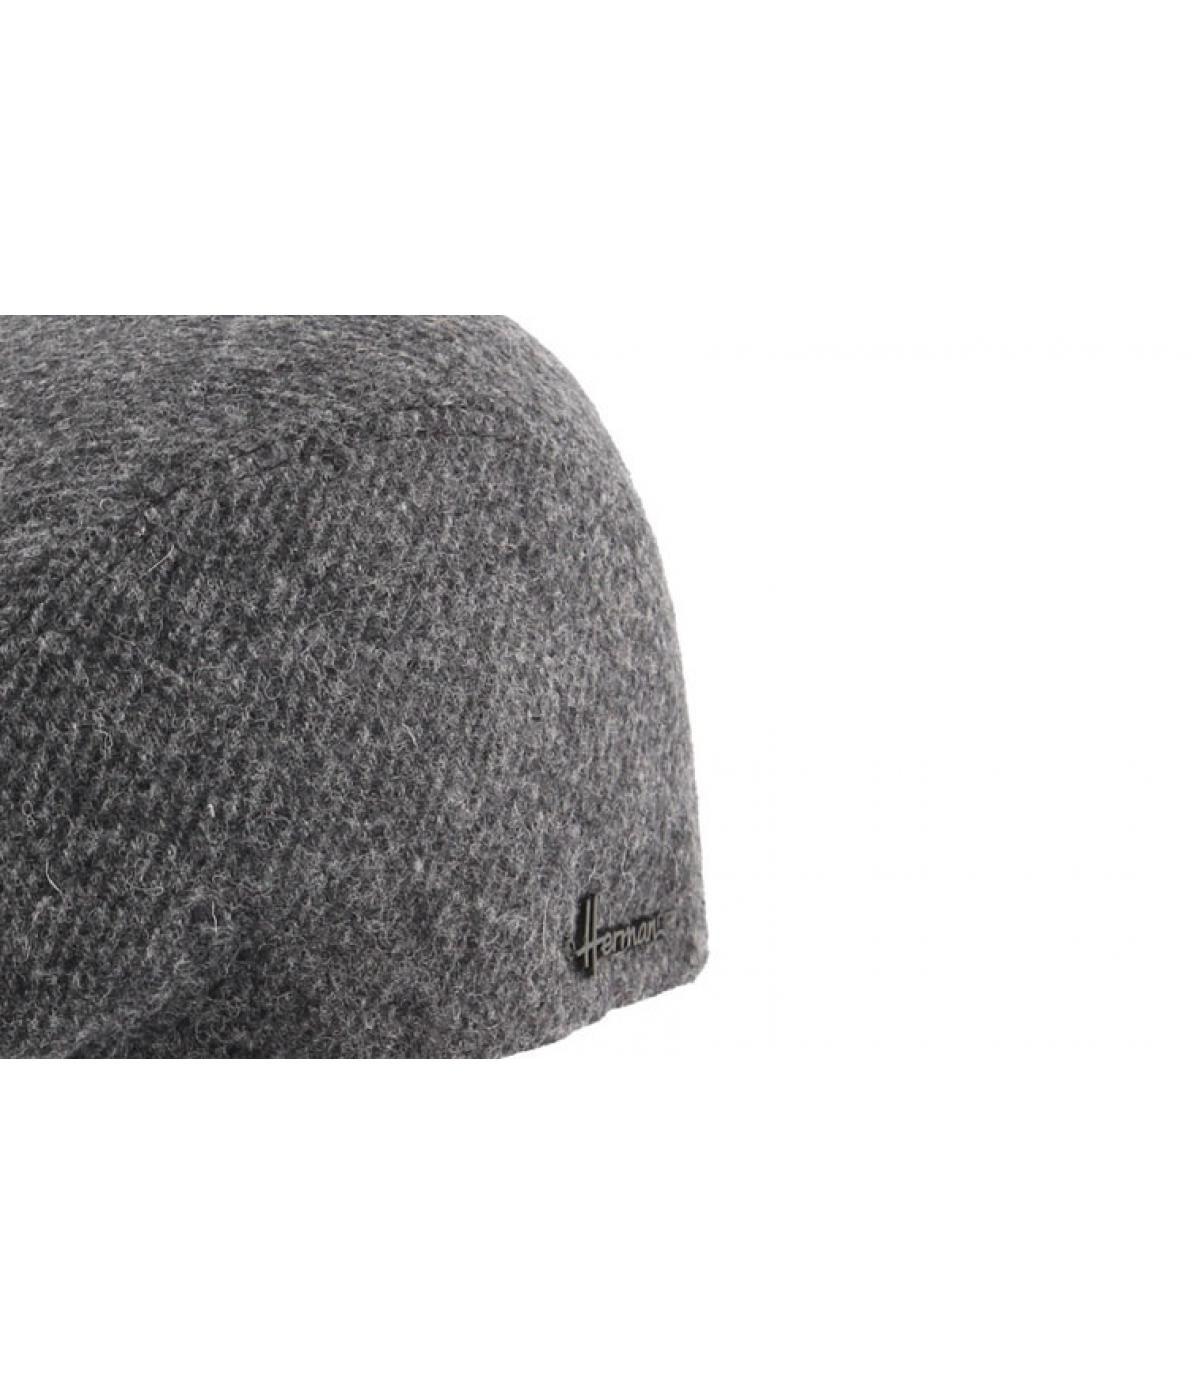 Detalles Hill wool EF grey imagen 3